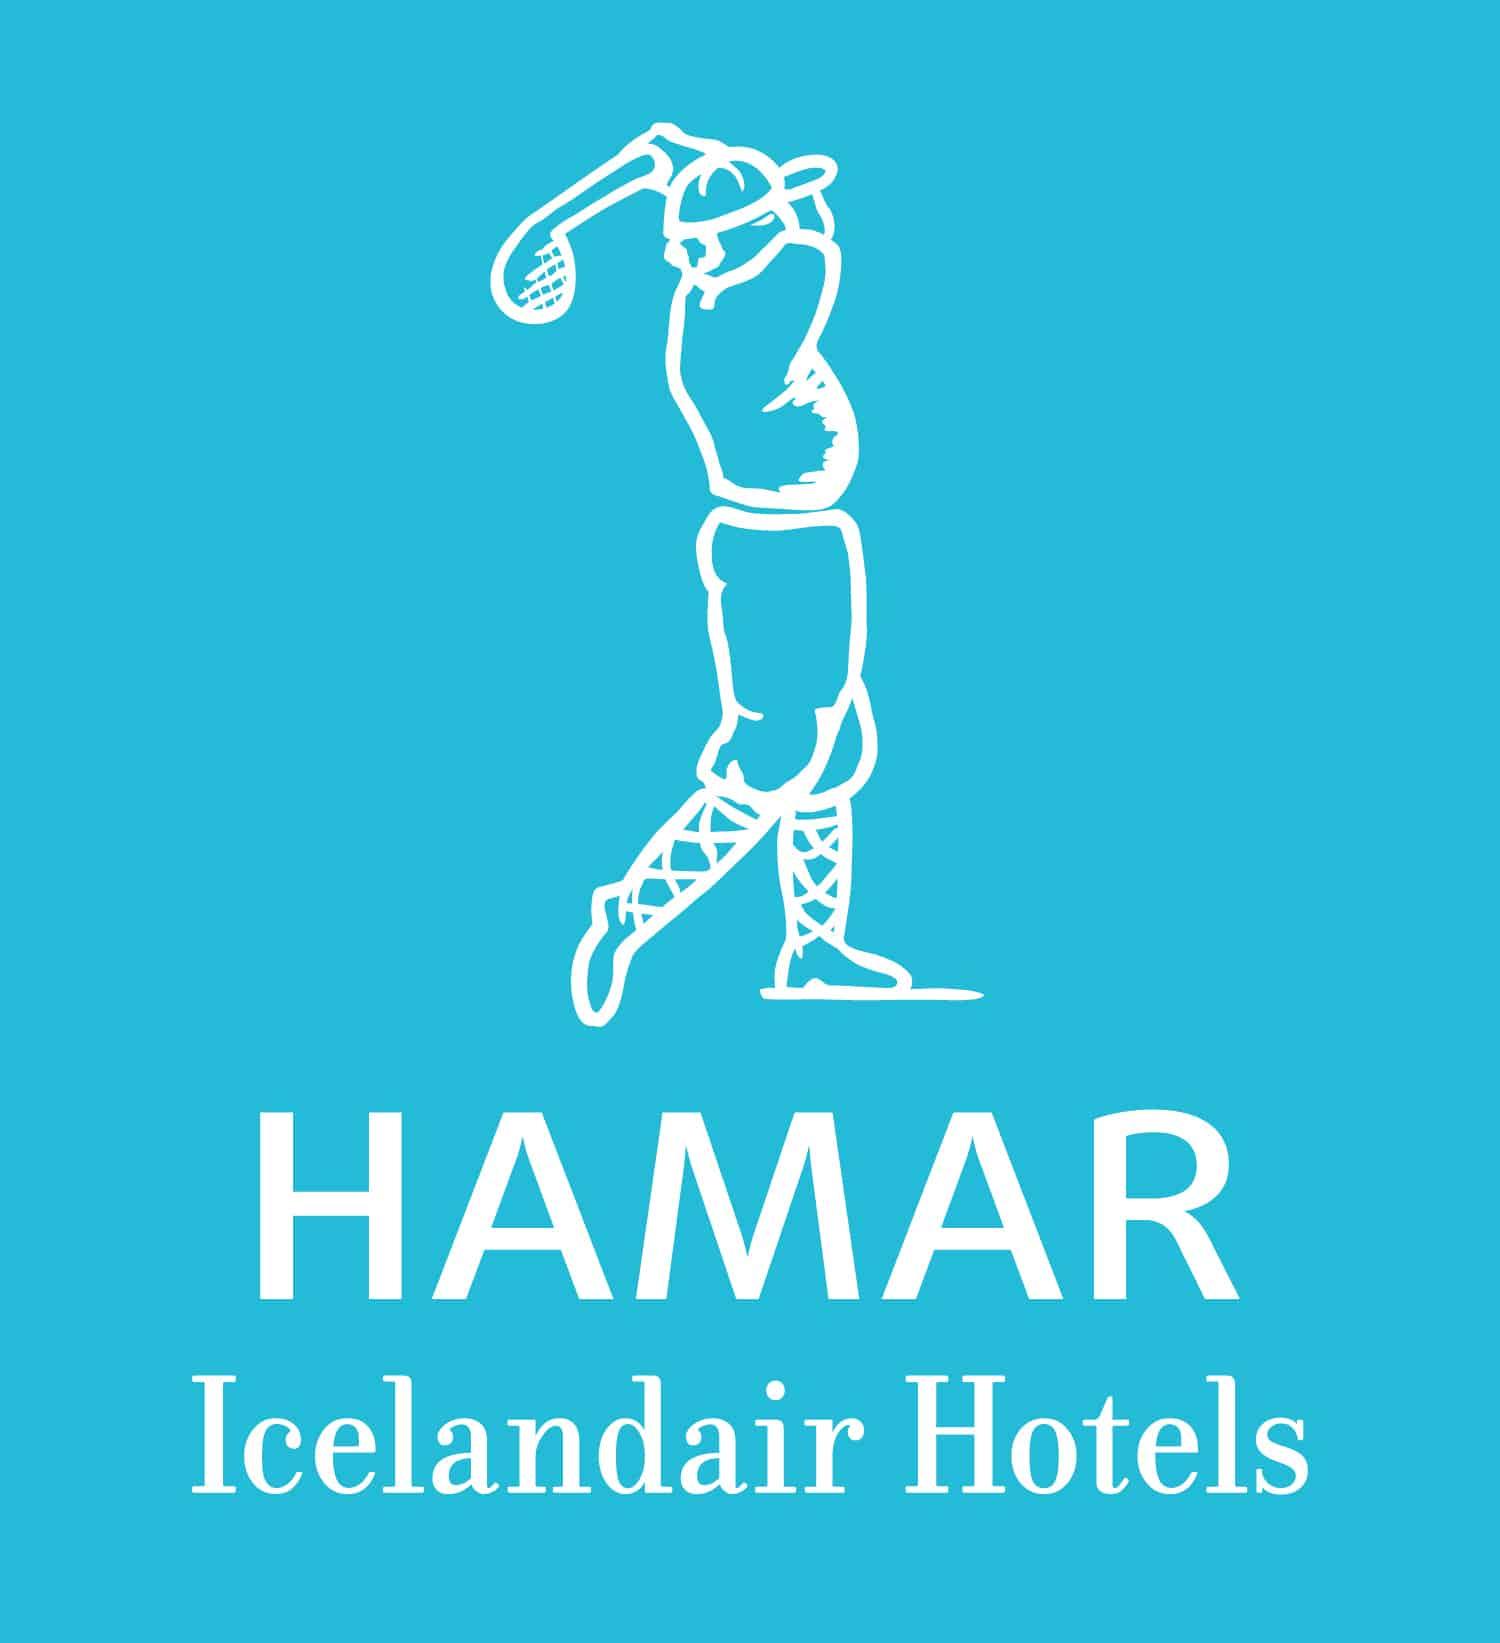 Icelandair.Hotel.Hamar